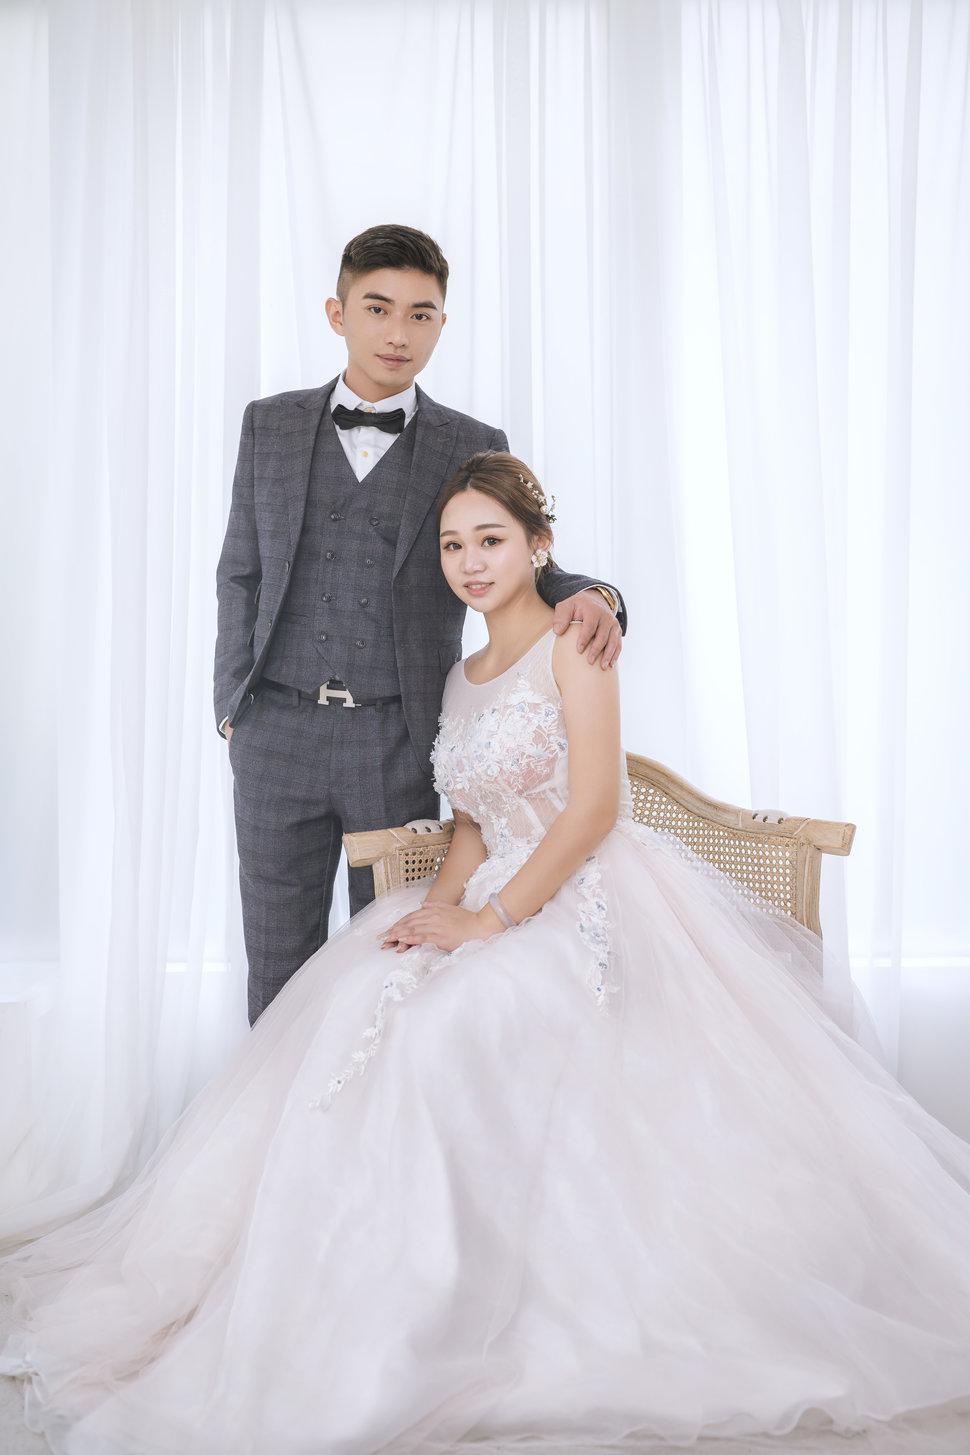 P1_06060 - 基隆台北全省Sandy新娘秘書《結婚吧》